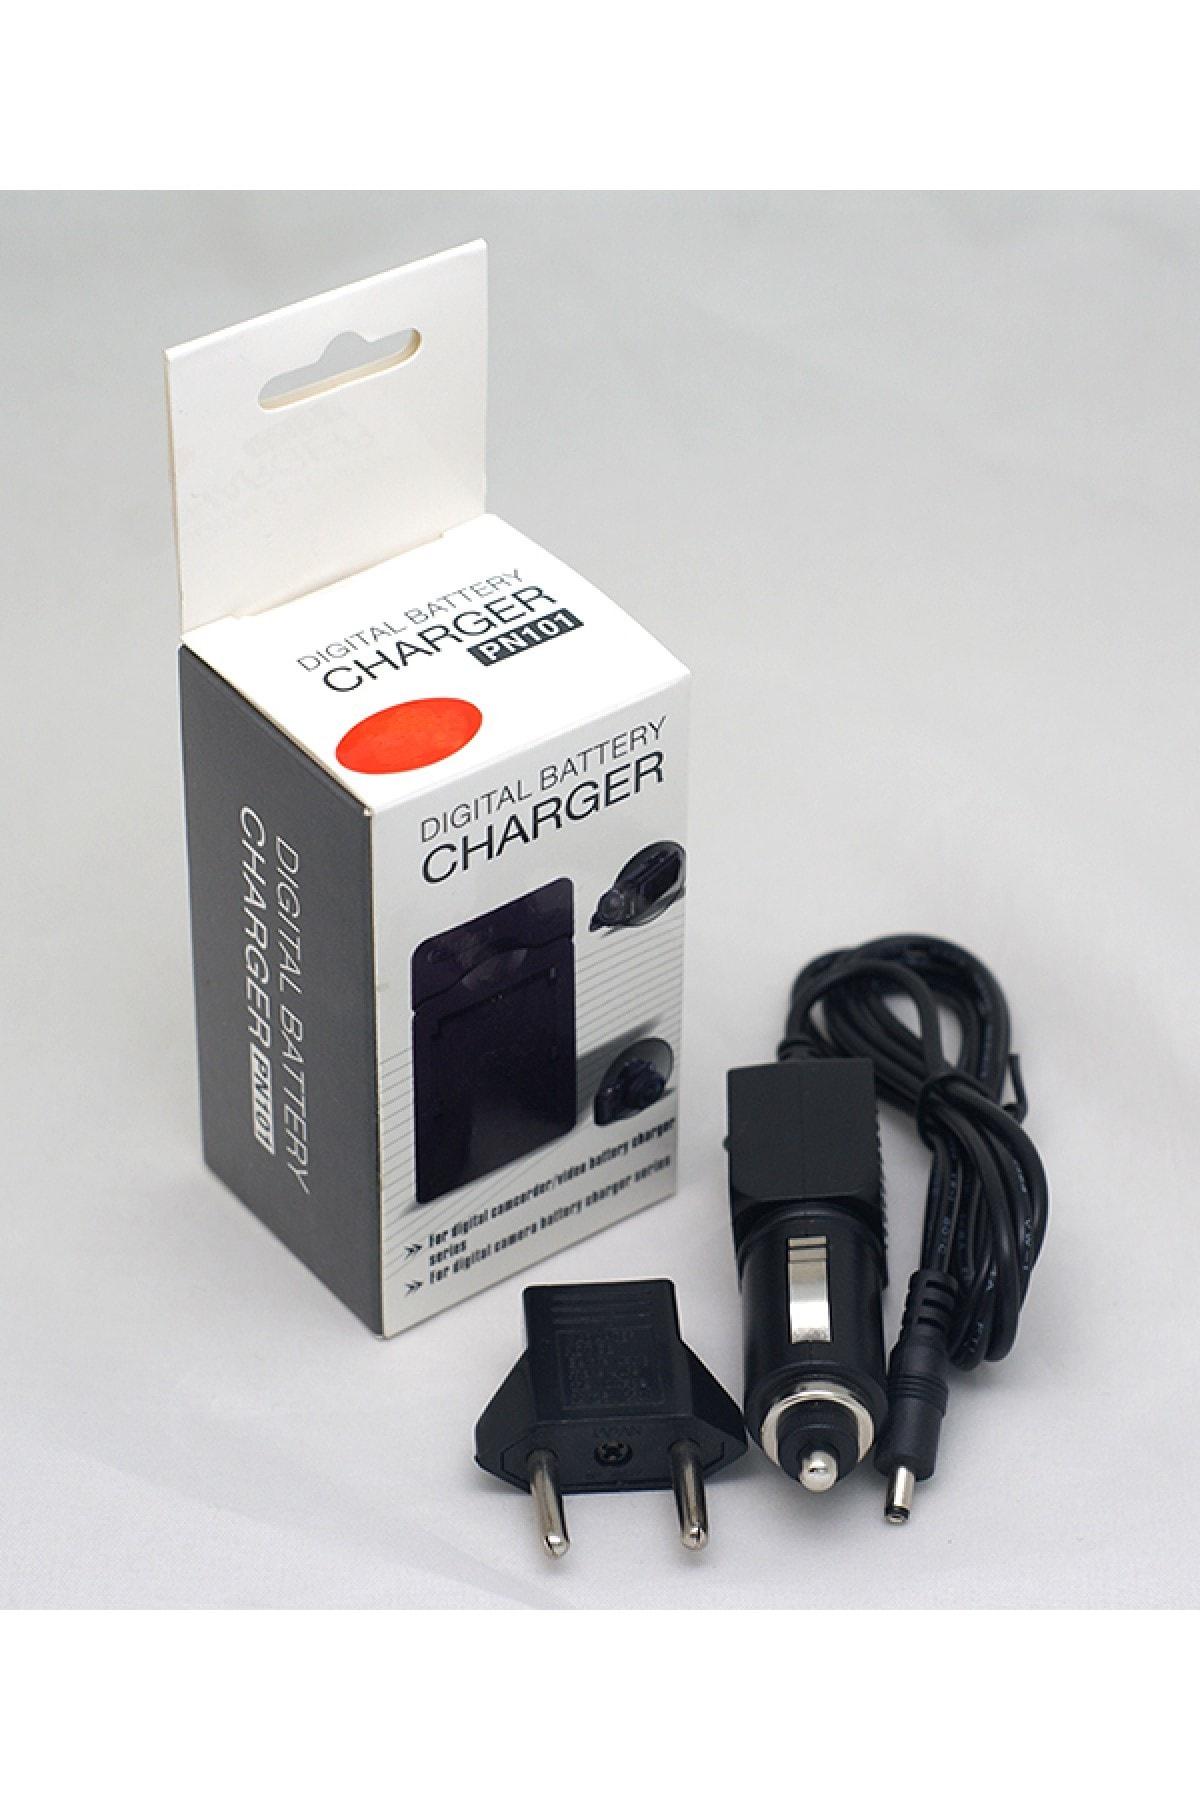 DBK Fujifilm NP-70, Ricoh DB-60, Leica BP-DC4 İçin Şarj Cihaz